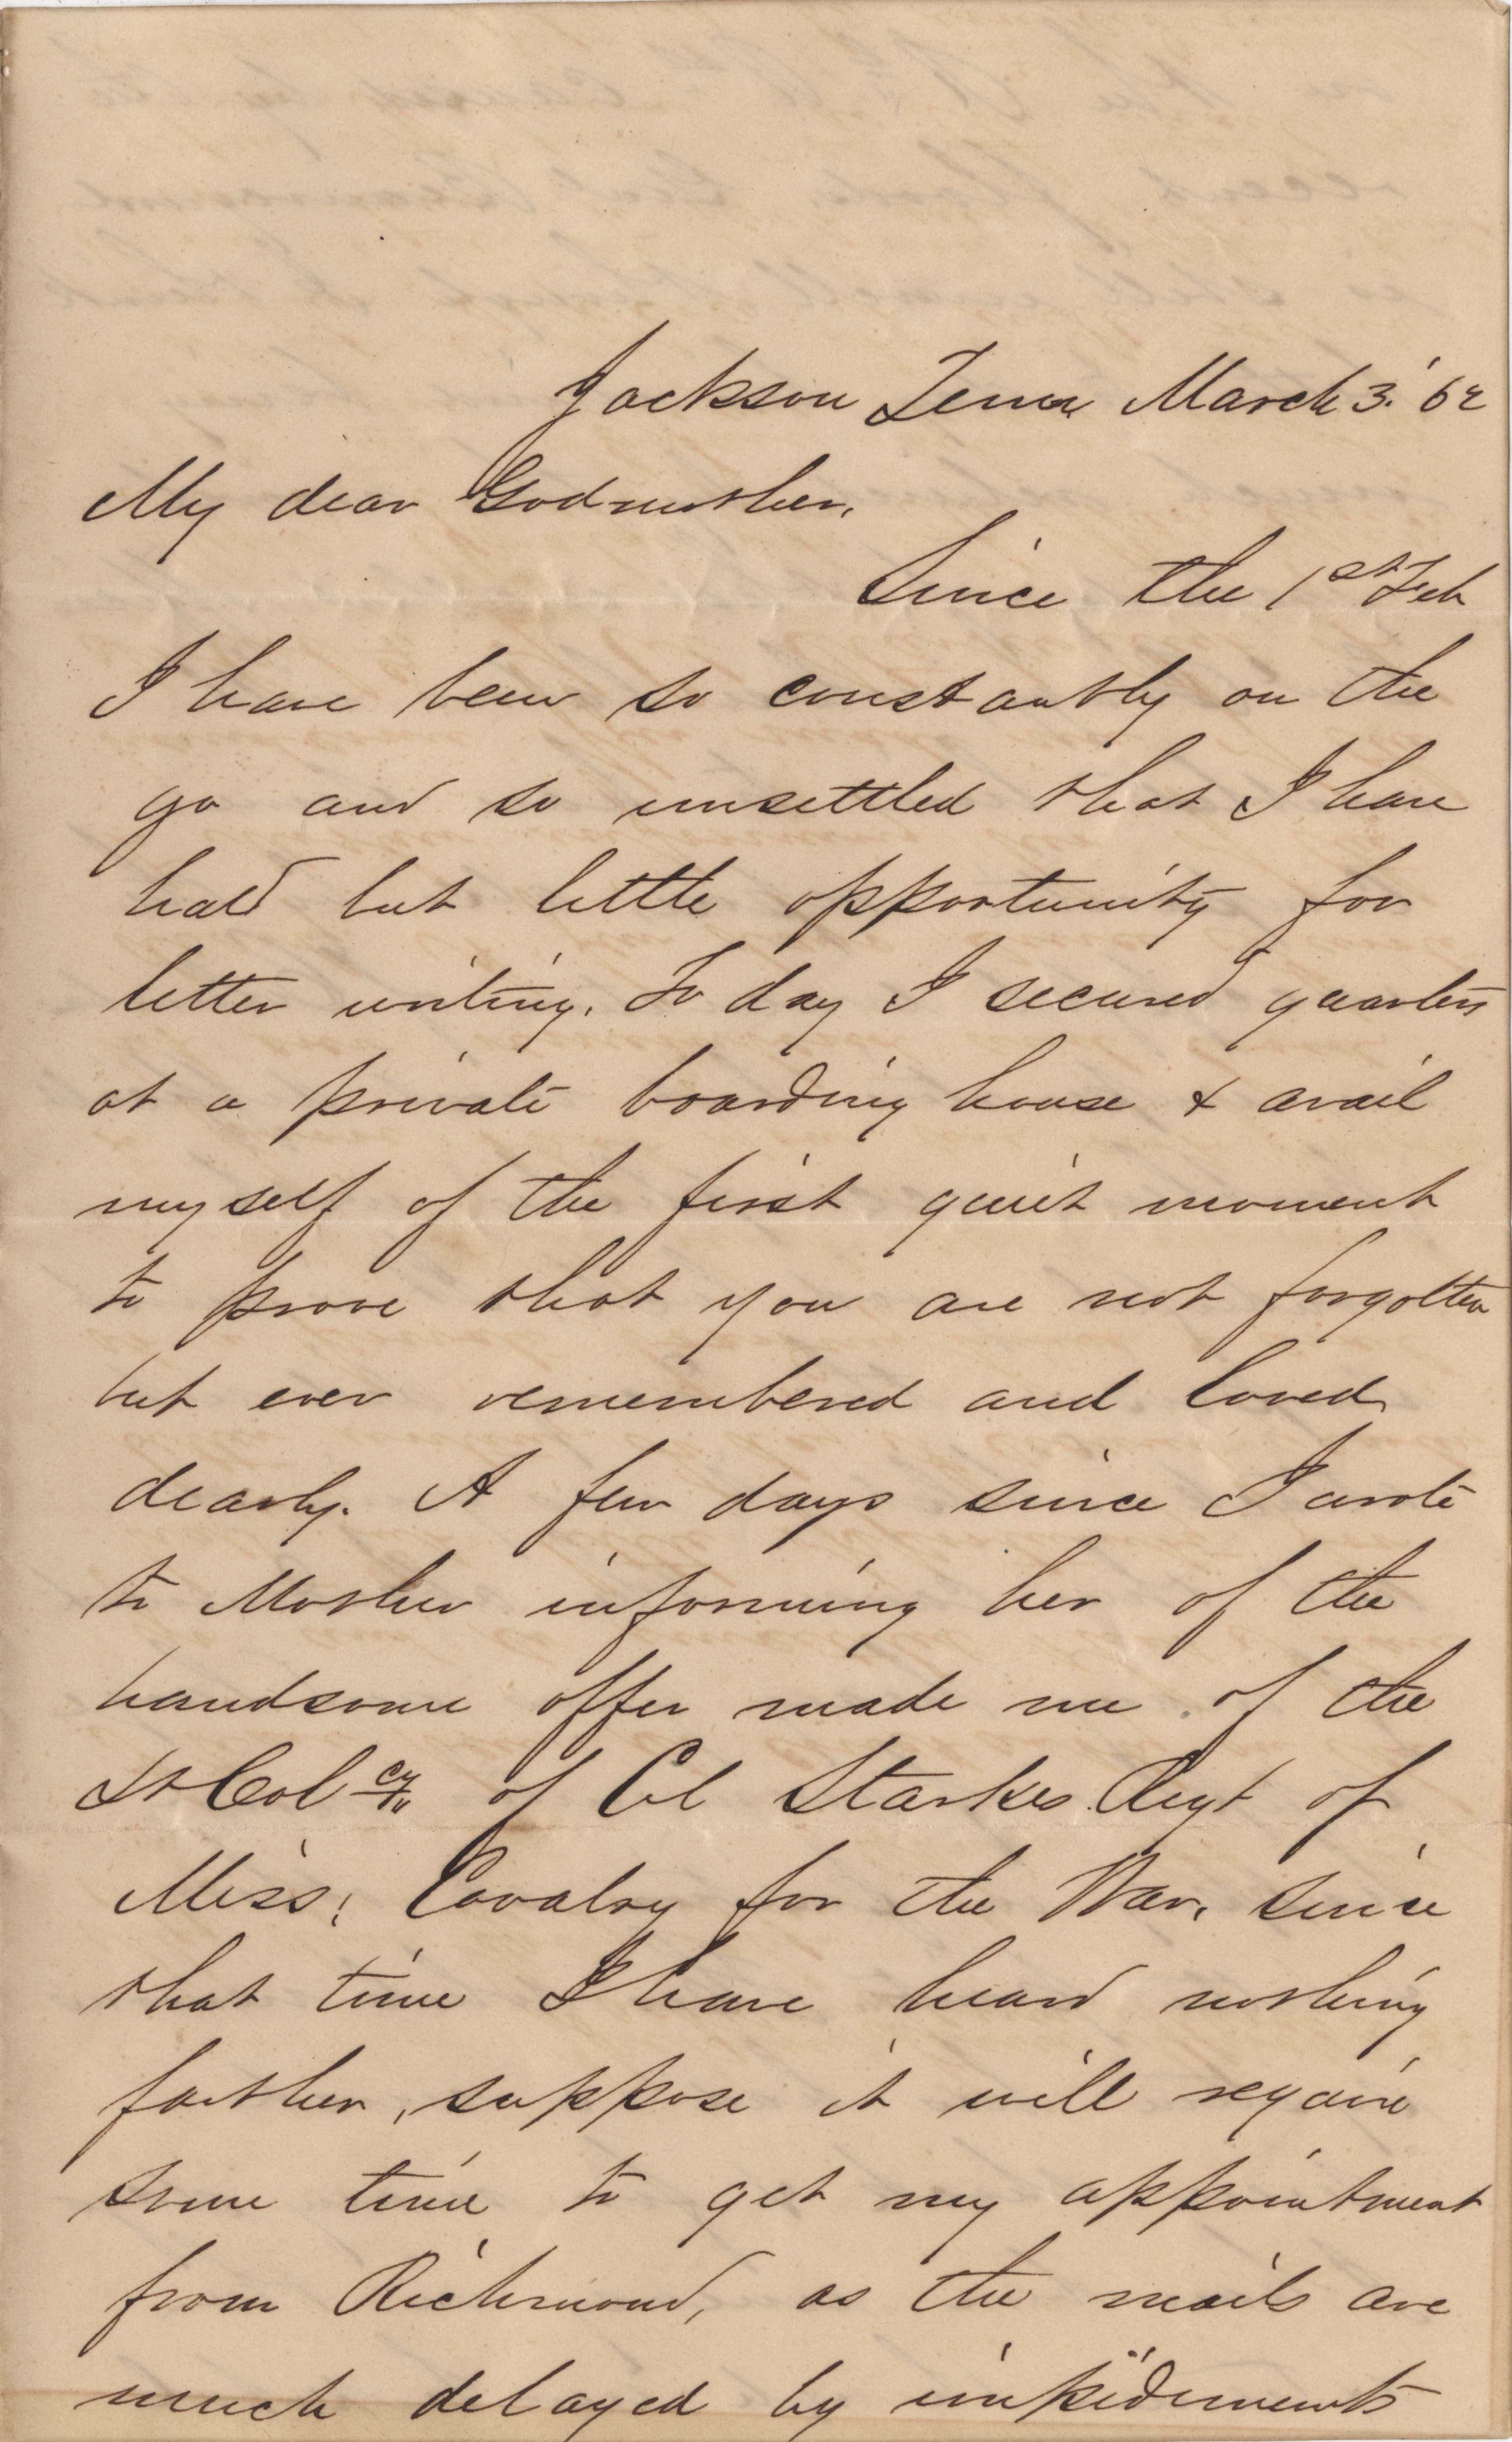 098. Samuel Wragg Ferguson to F.R. Barker (Godmother) -- March 3, 1862